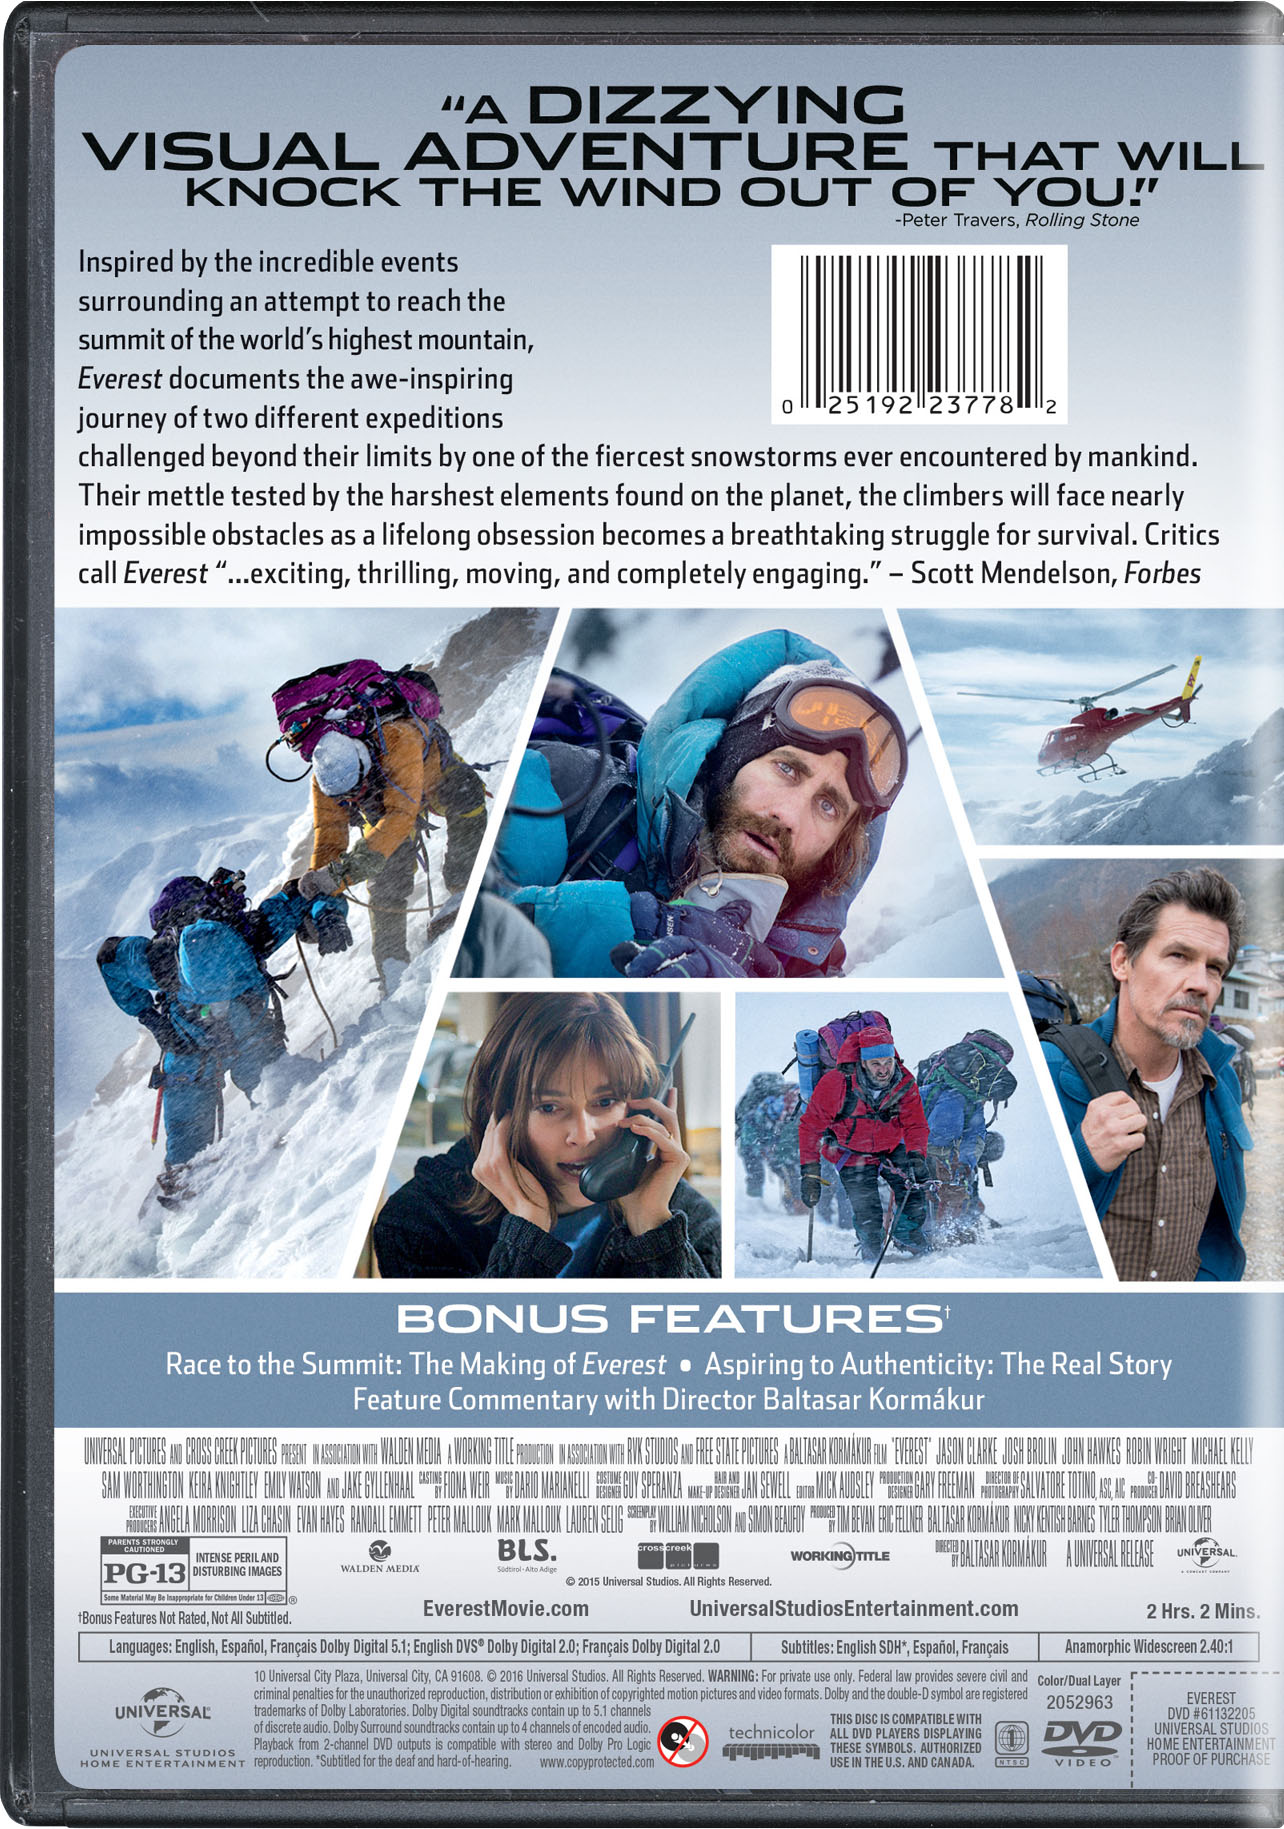 everest movie page dvd bluray digital hd on demand